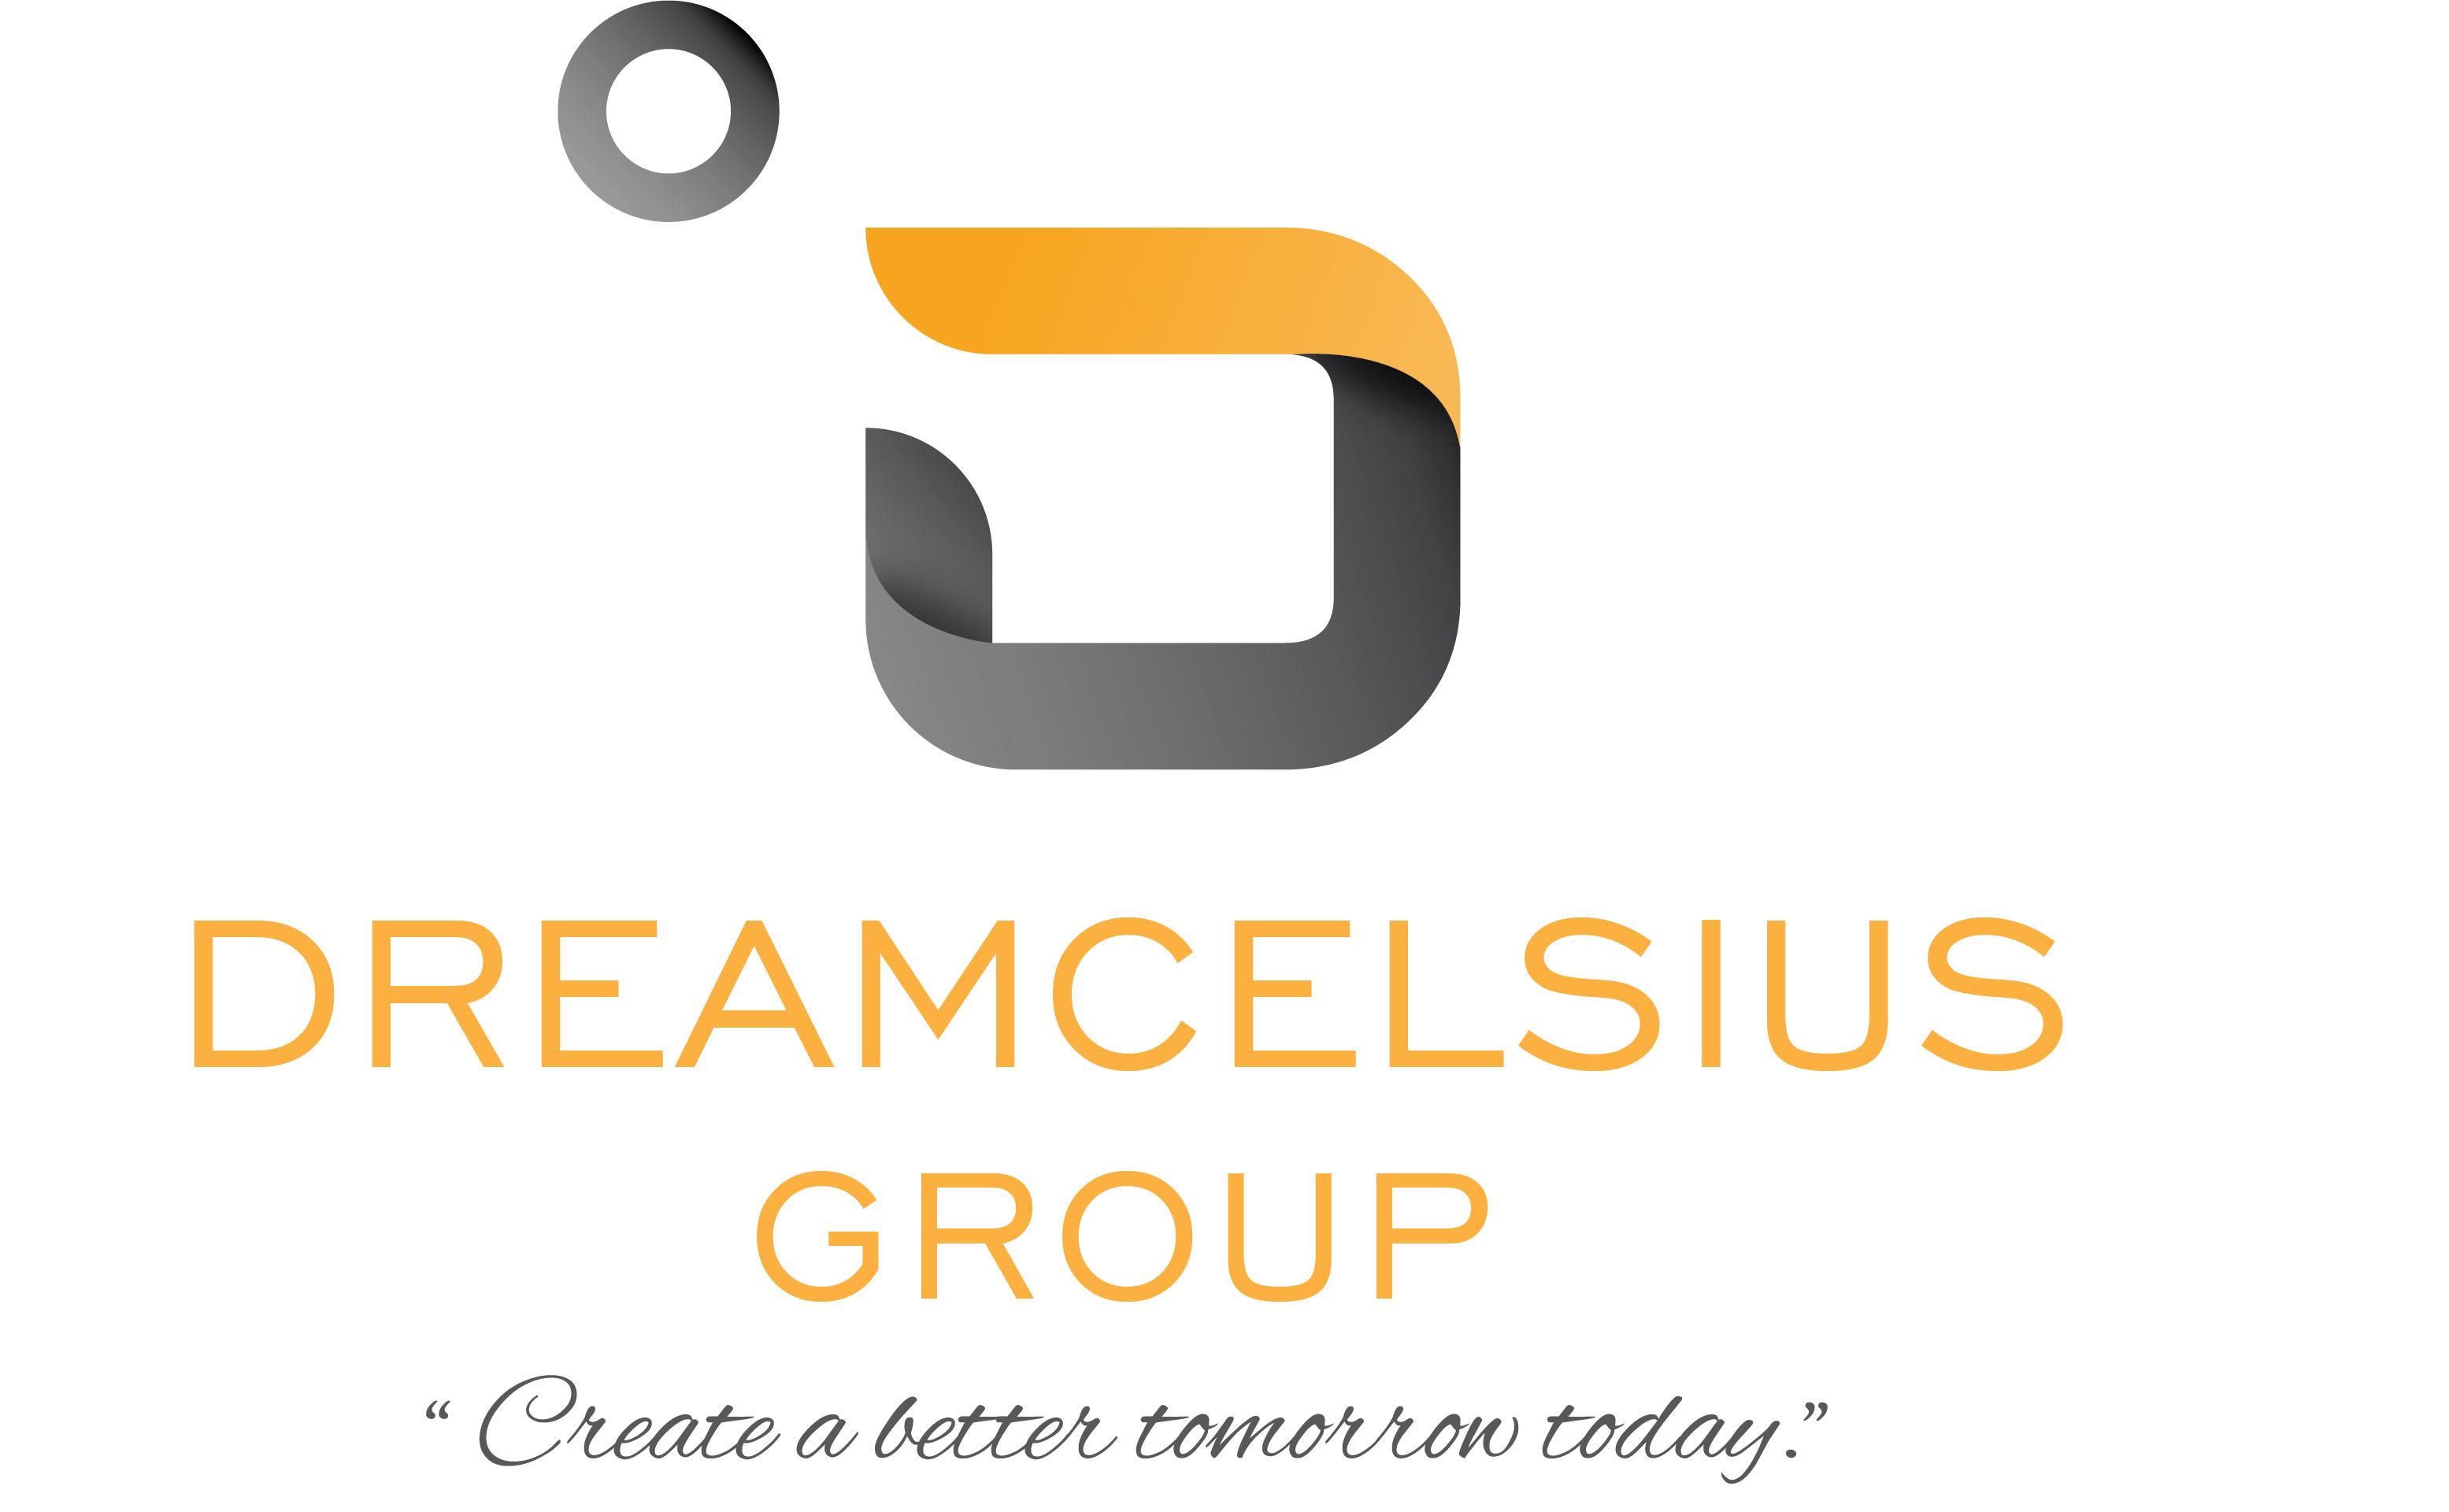 Dreamcelsius Group